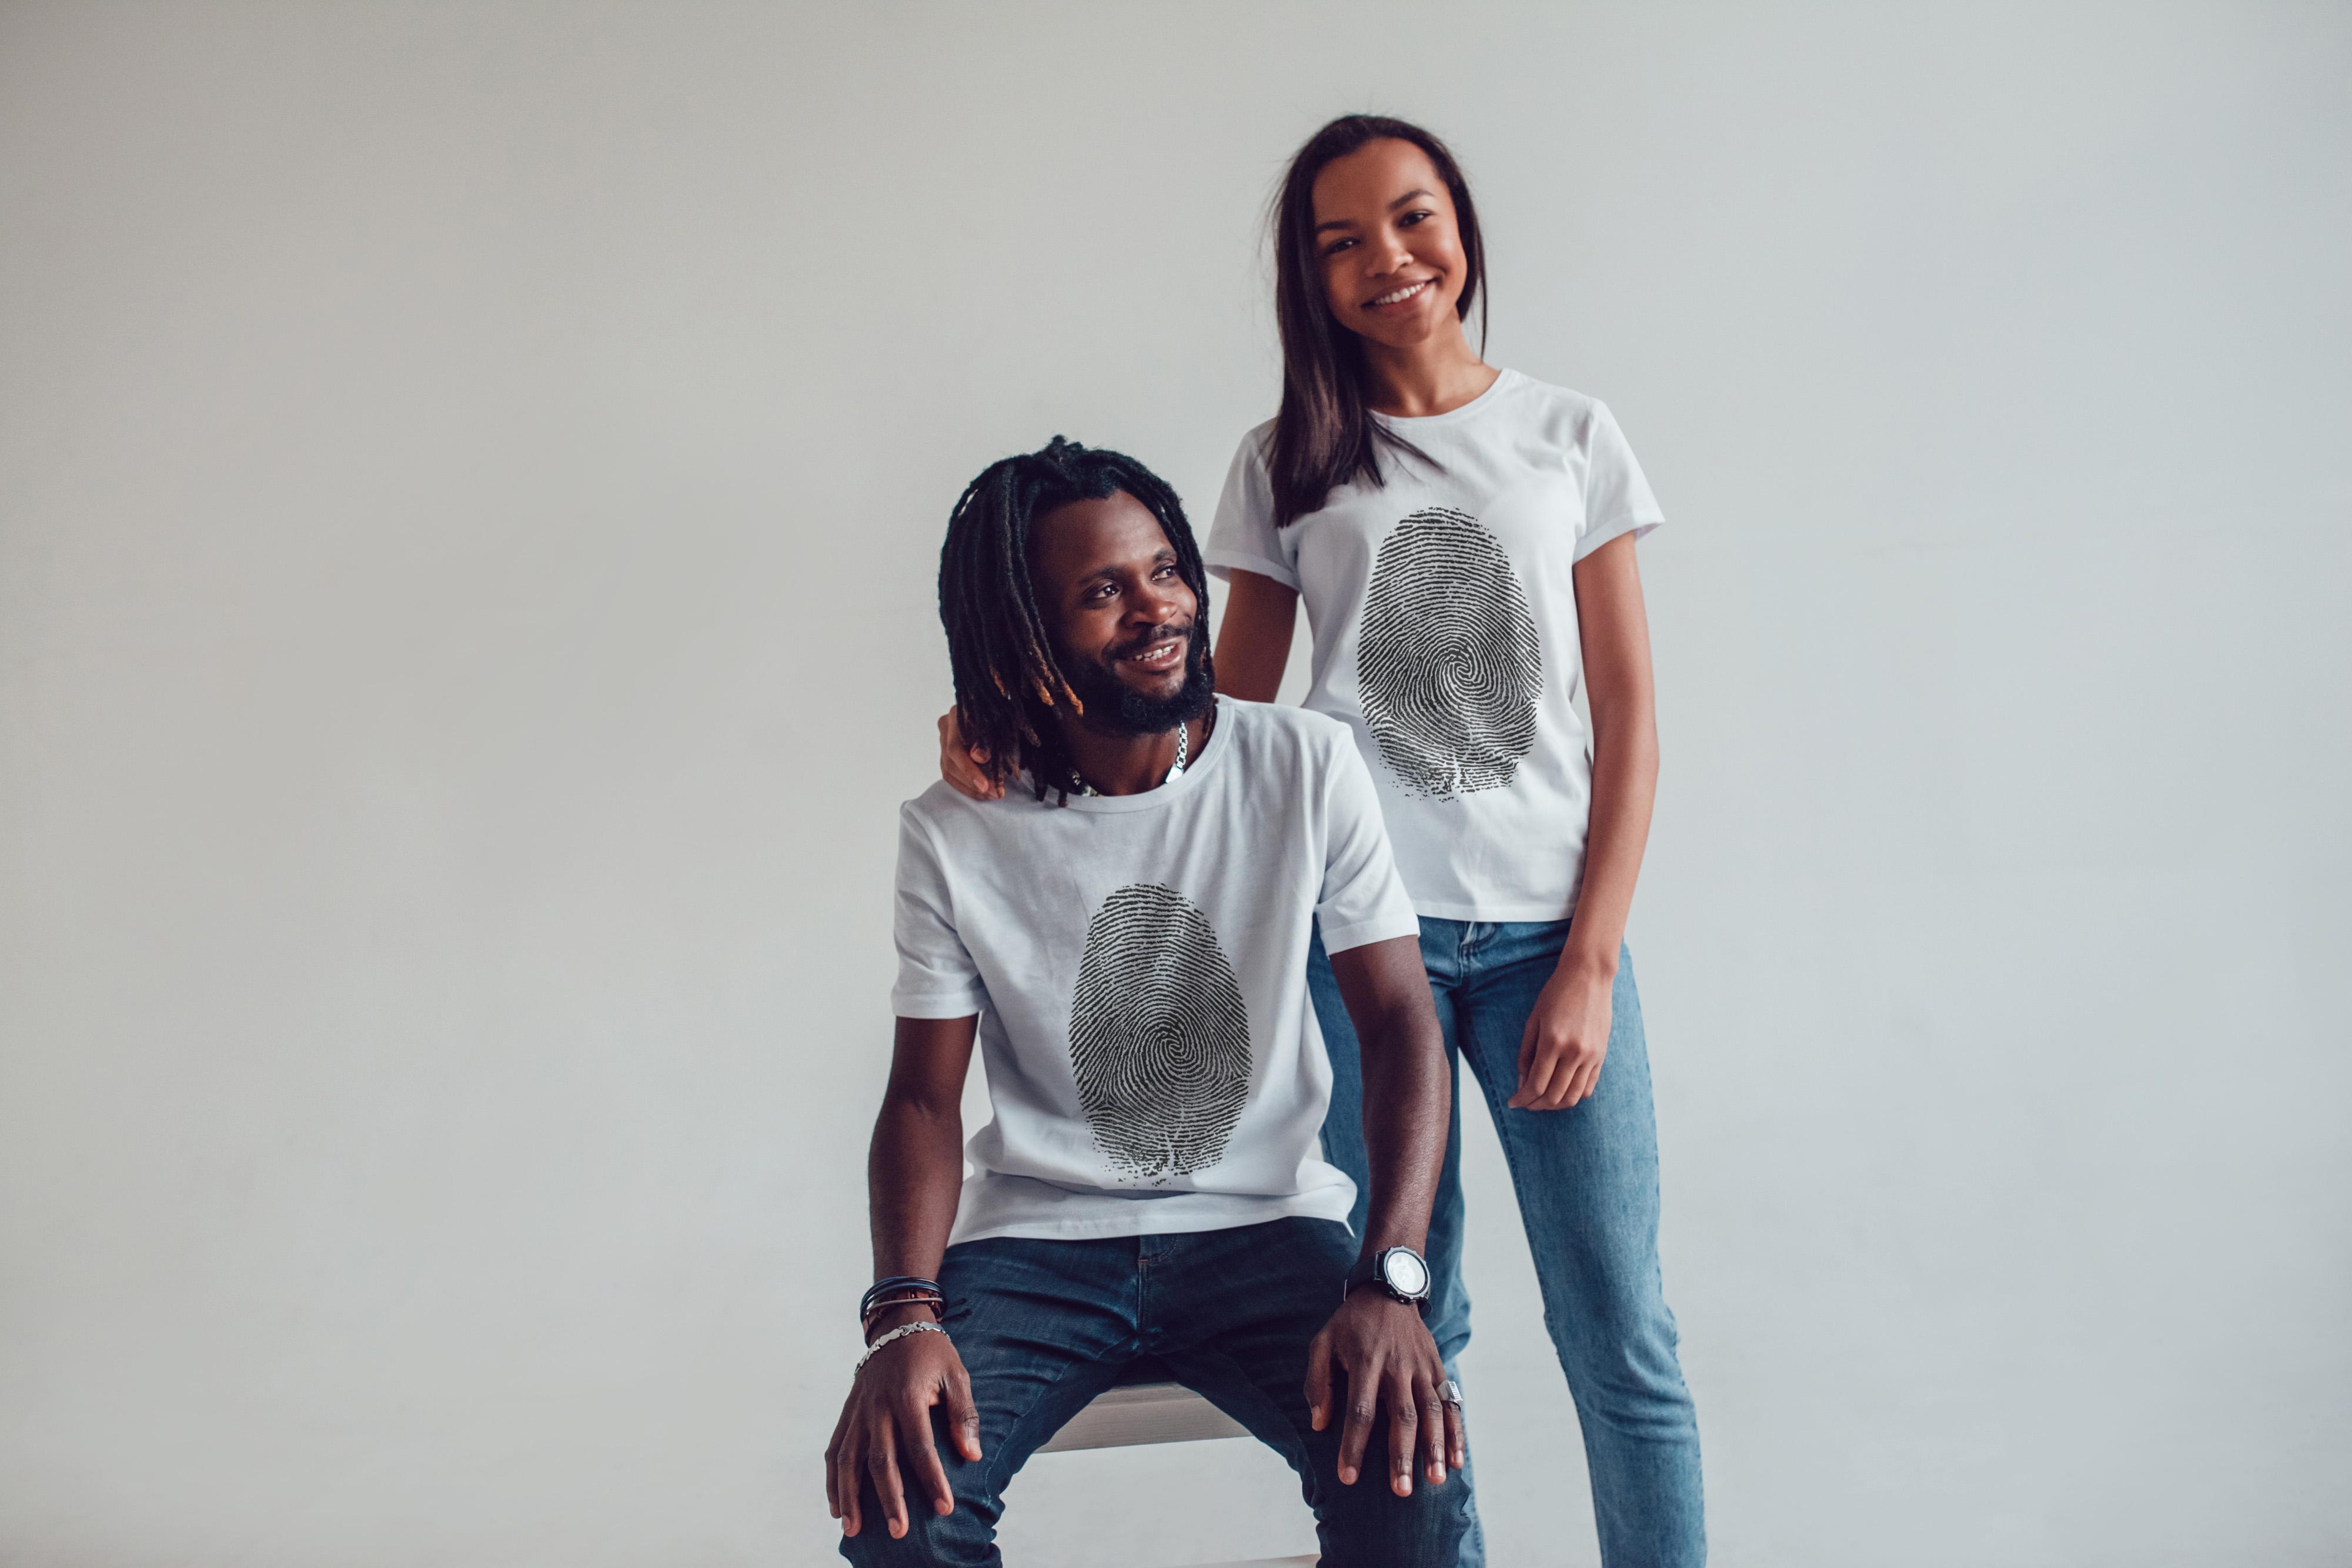 T-Shirt Mock-Up 2018 #1 example image 4